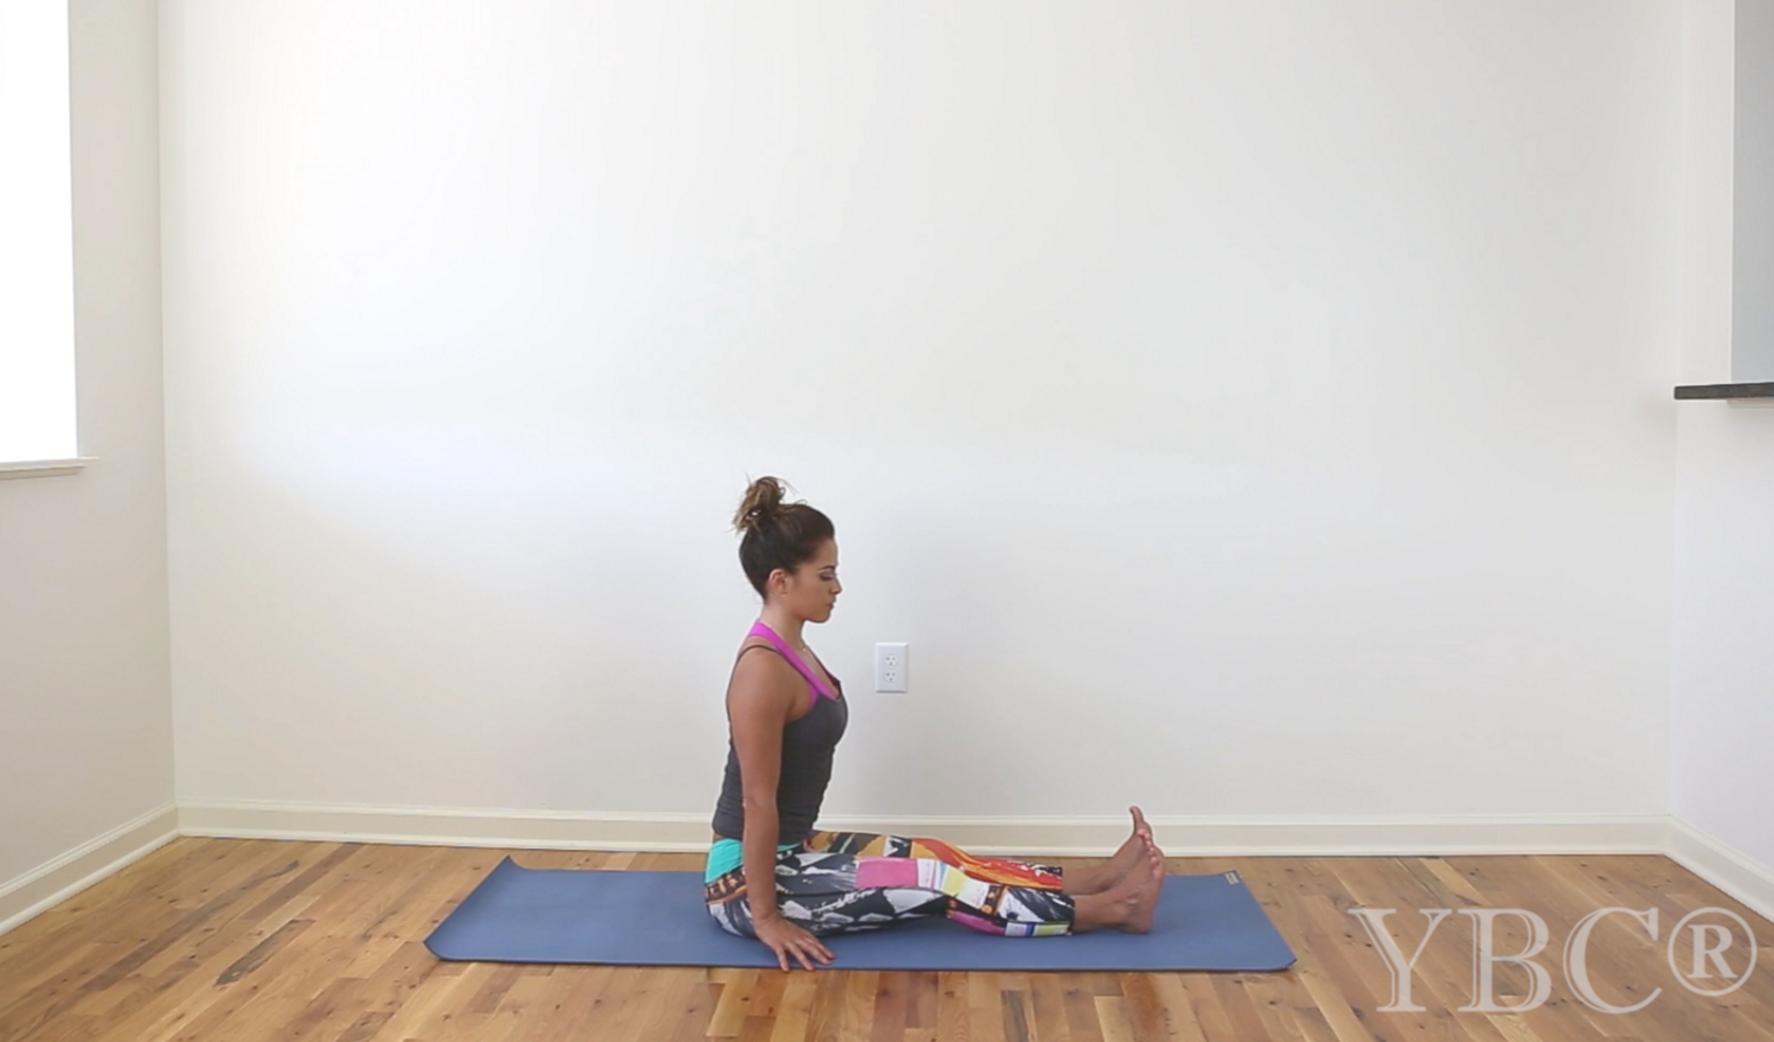 15 Minute Cool Down Yoga Video  Wearing:  Prism Sport pants , Sadhana bra